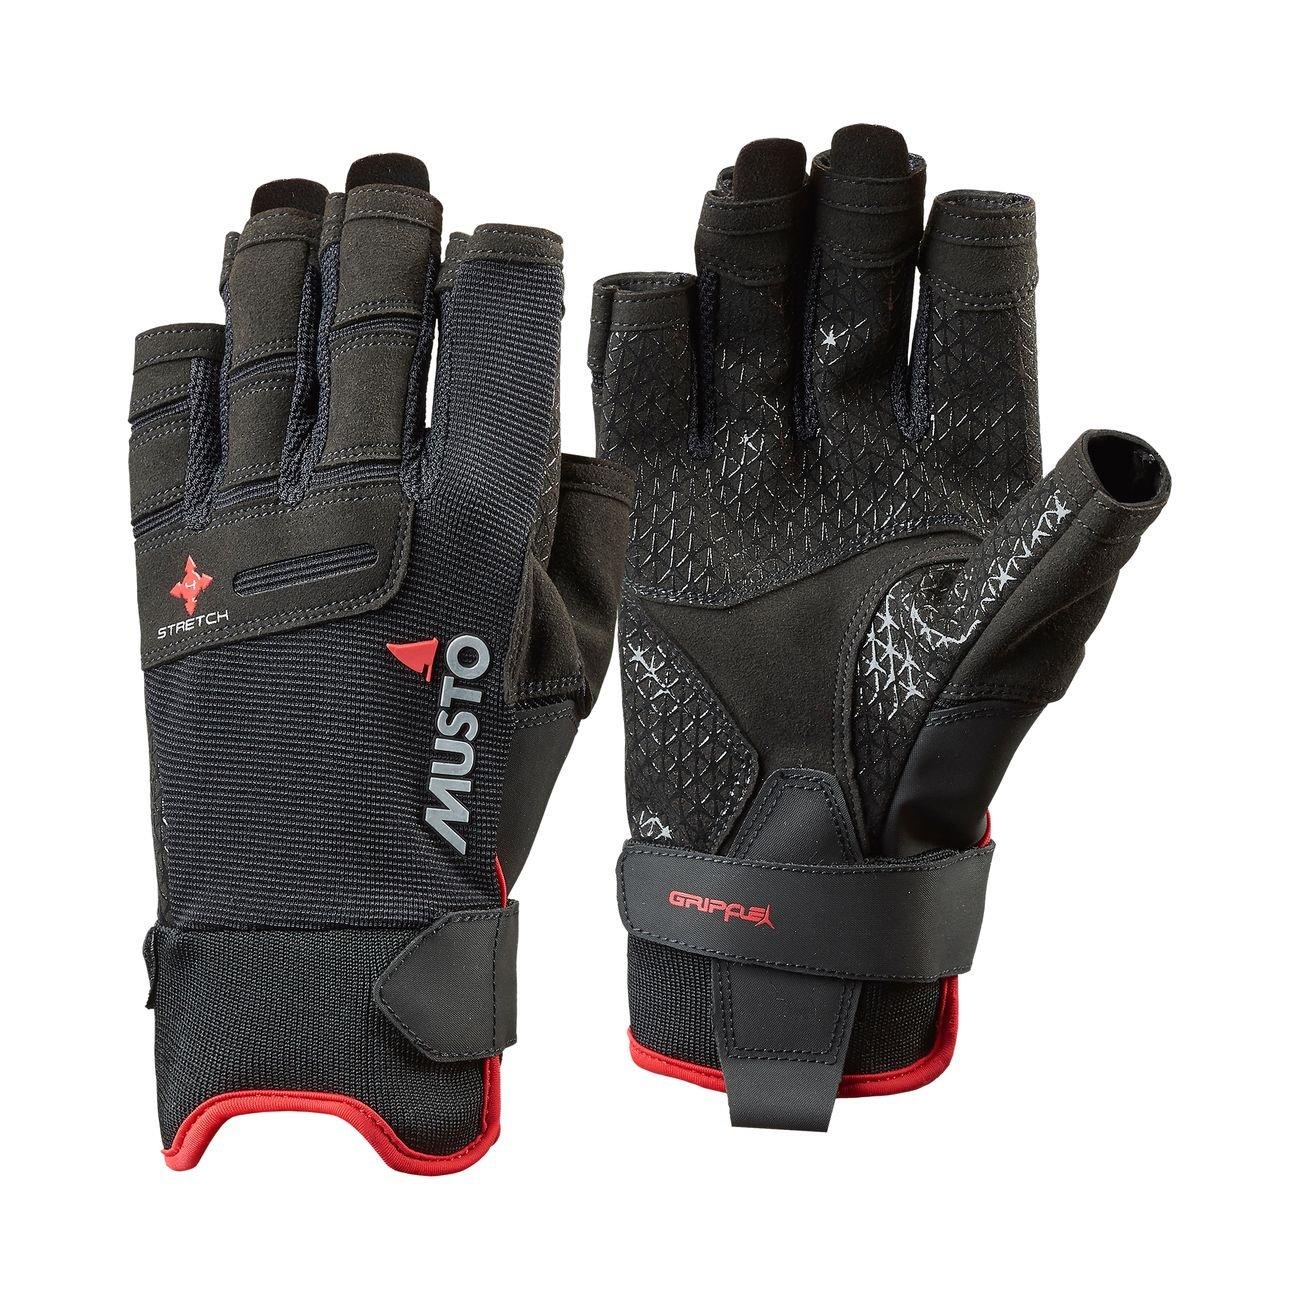 MustoパフォーマンスShort B079V1BM8R Large Finger Sailing Gloves 2018 – 2018 – ブラック B079V1BM8R Large, イチカワシ:3d68caa5 --- sharoshka.org